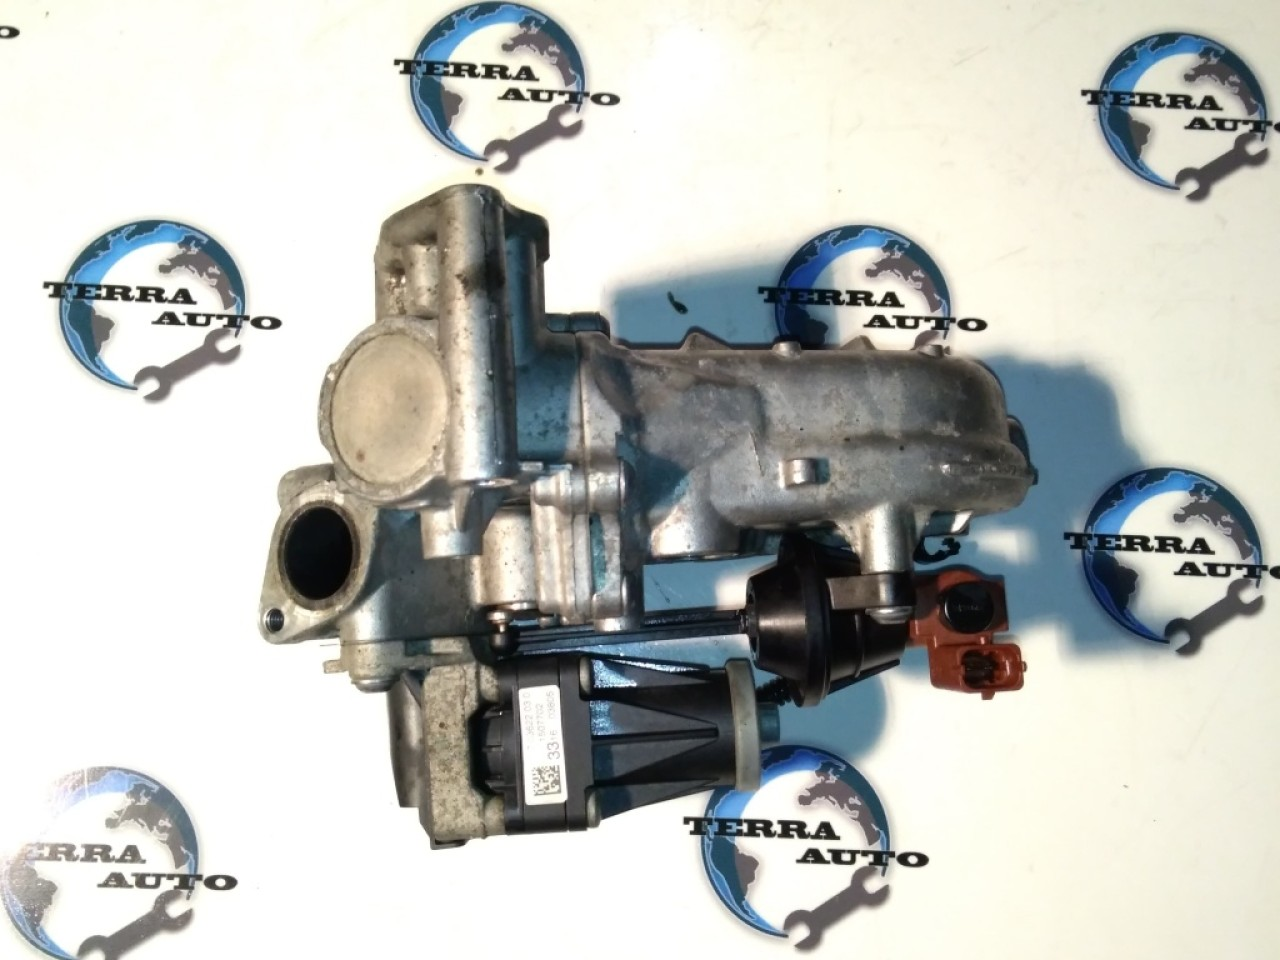 EGR cu racitor gaze Opel Corsa D 1.3 CDTI - euro 5, 55kw 75 cp, cod motor Z13DTJ